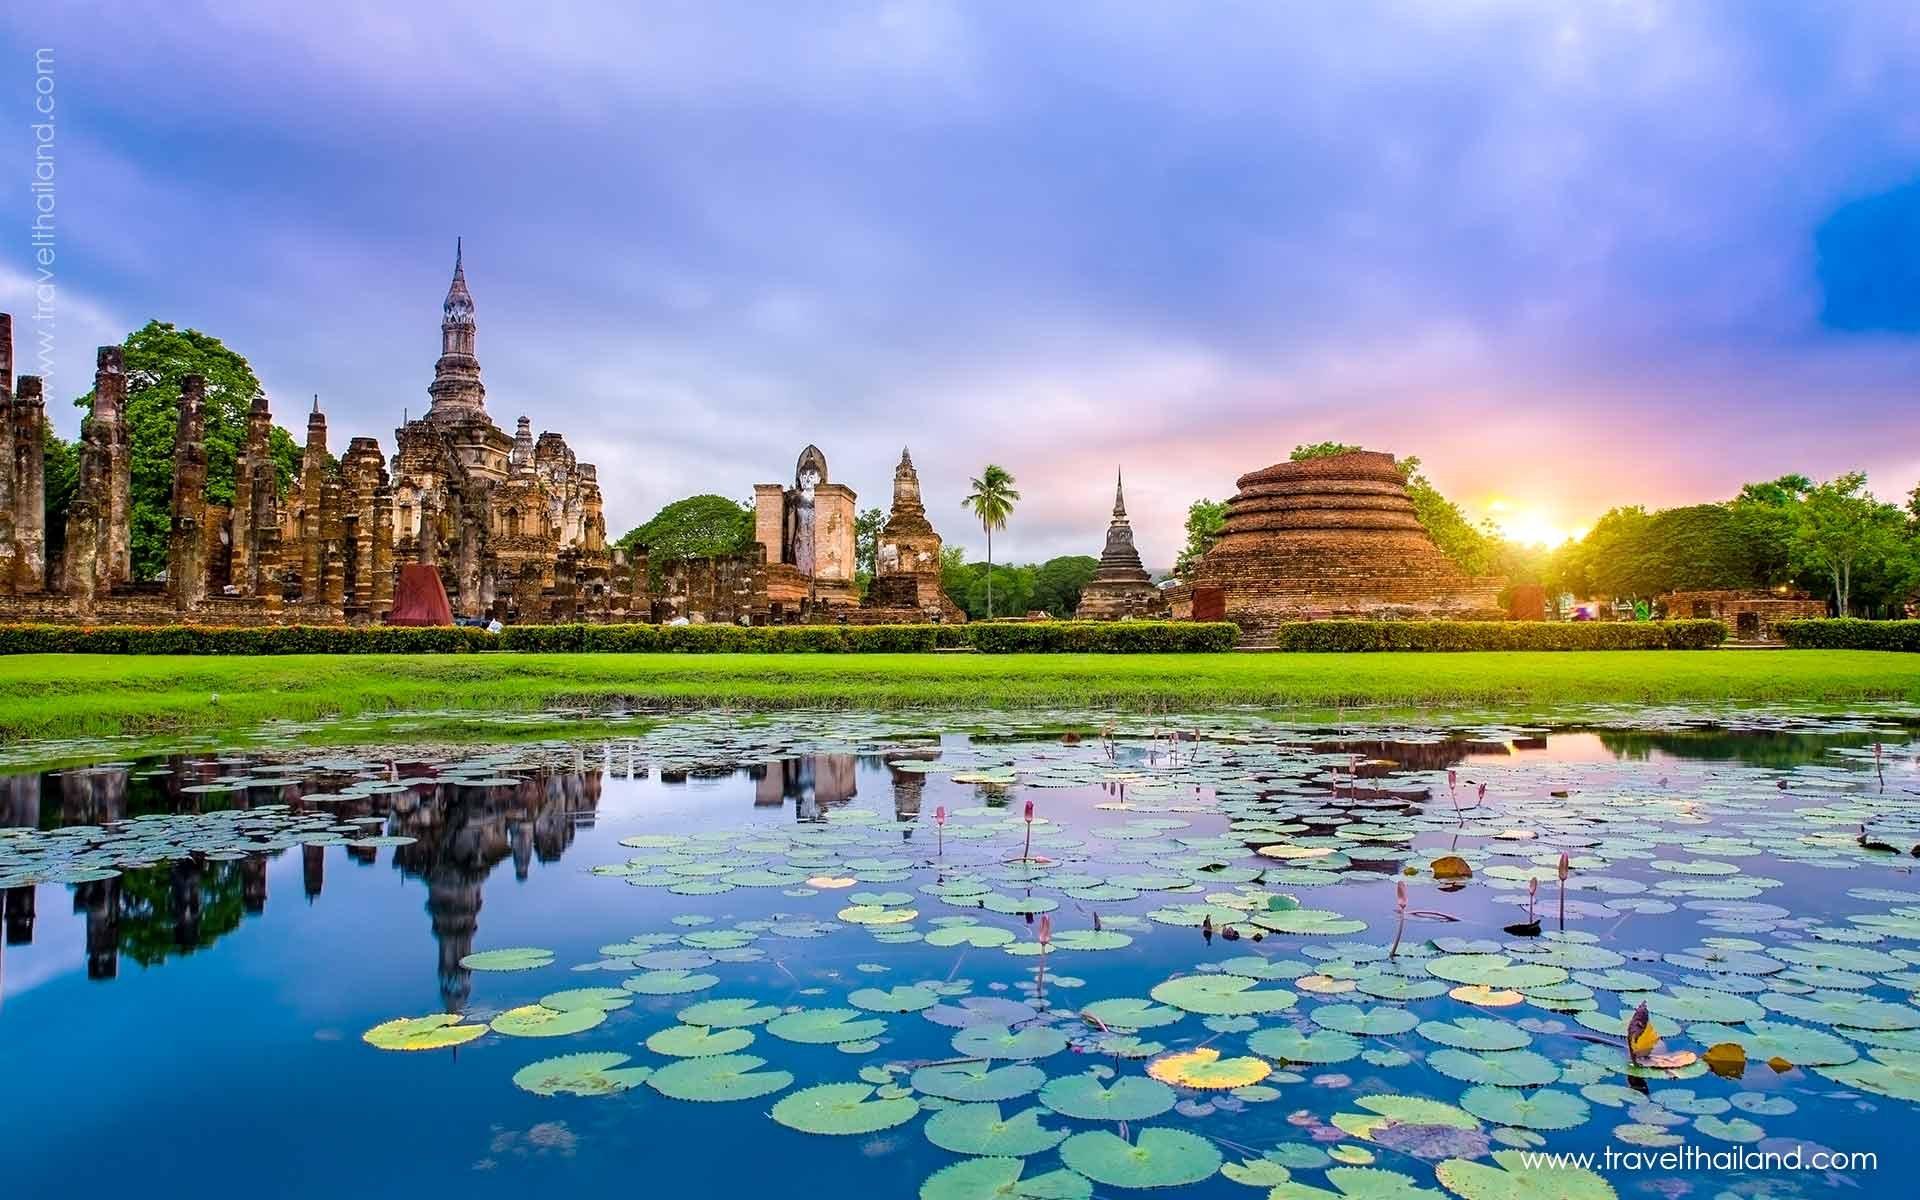 The Treasures of Thailand & Myanmar - 12 days